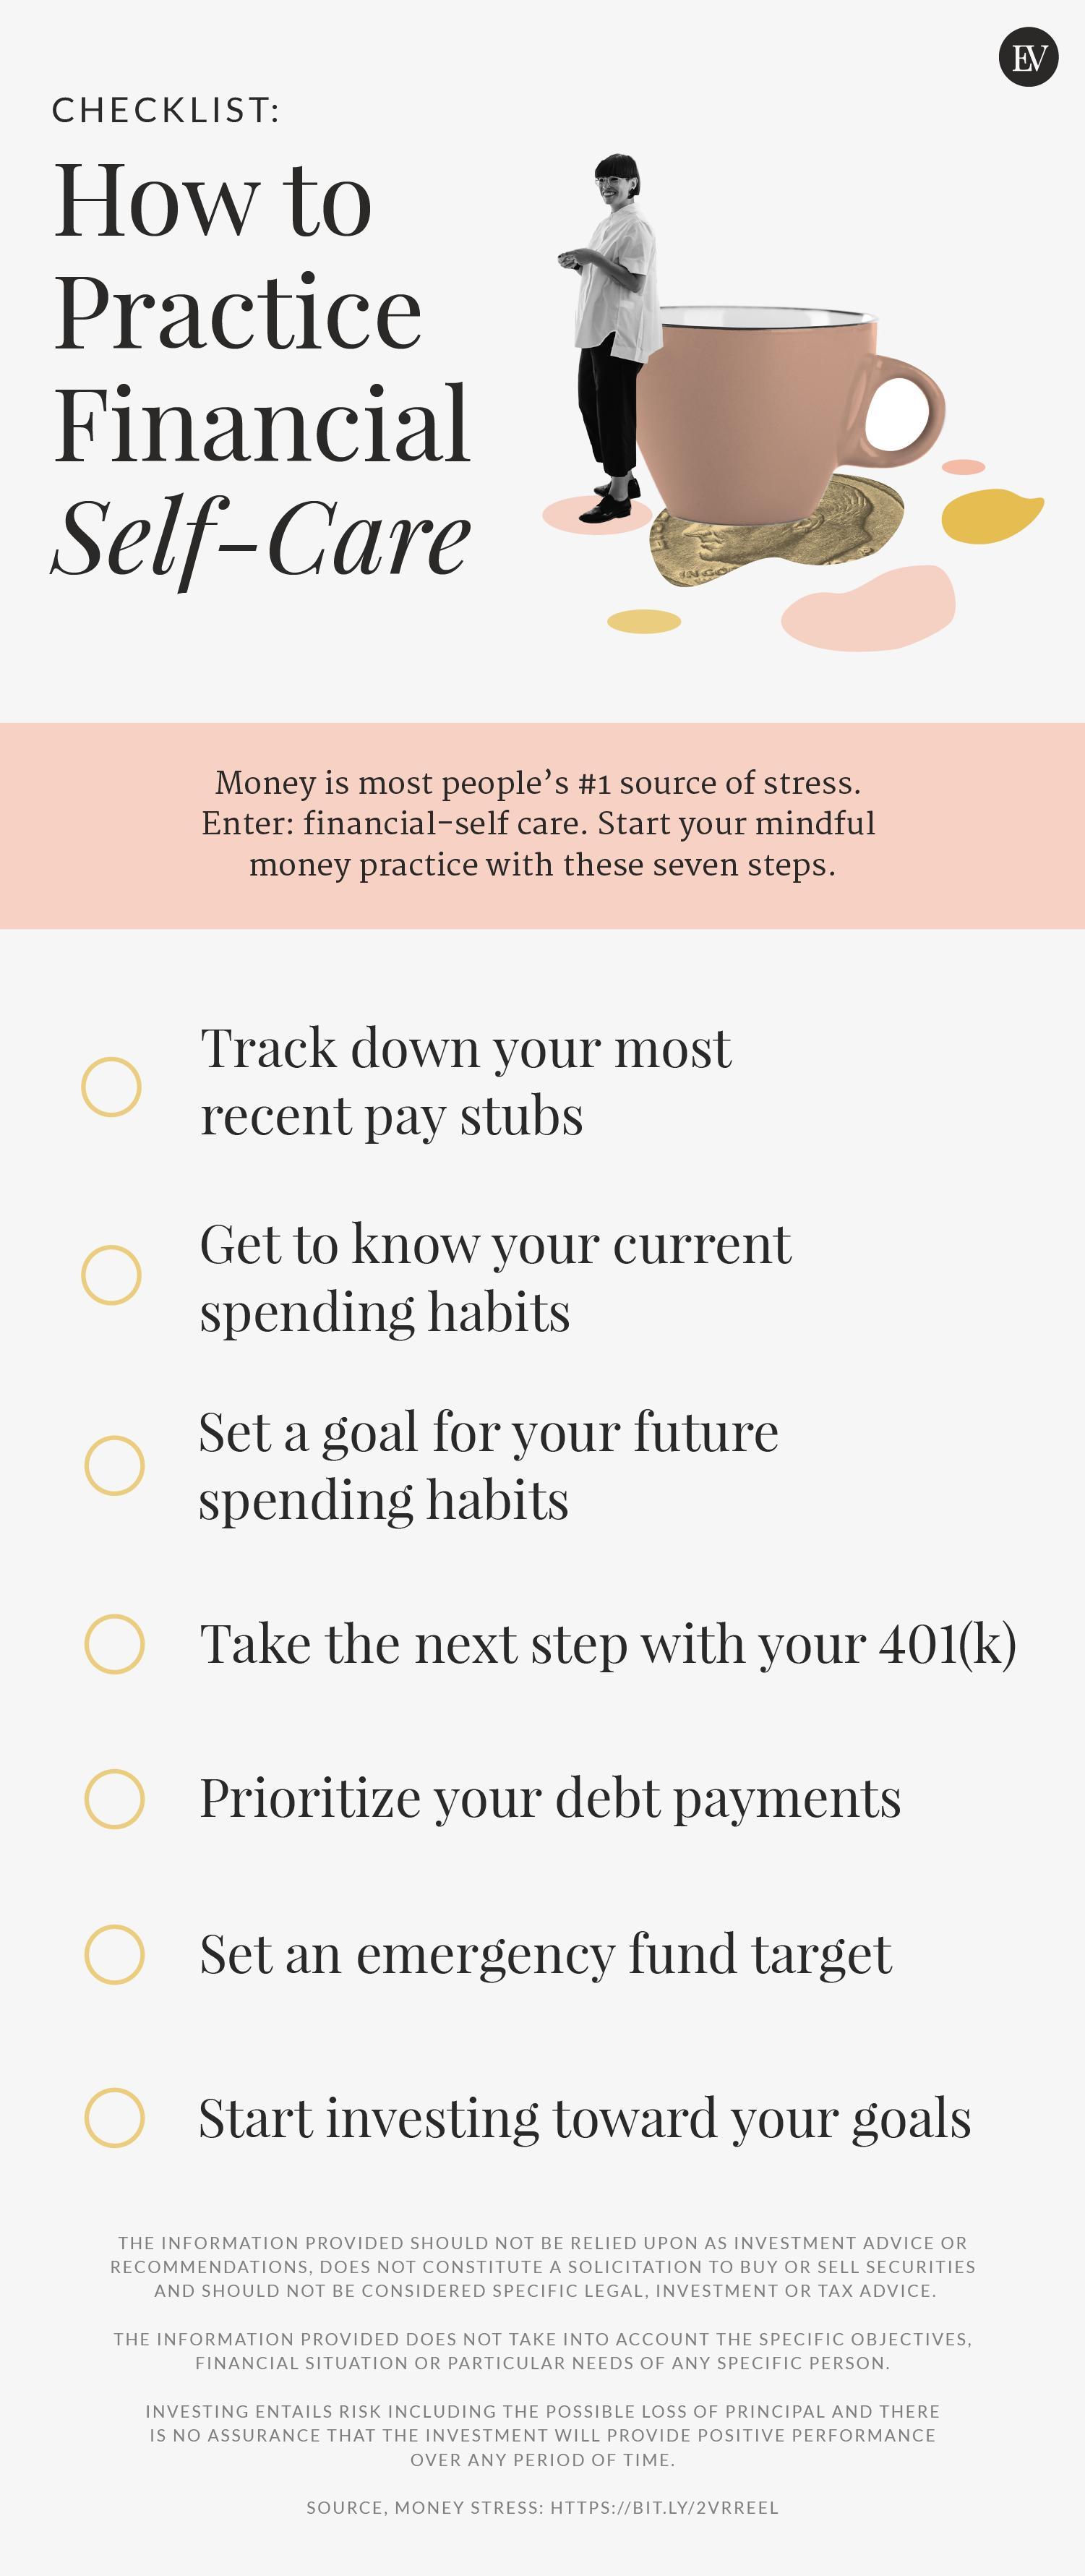 Your Financial Self-Care Checklist